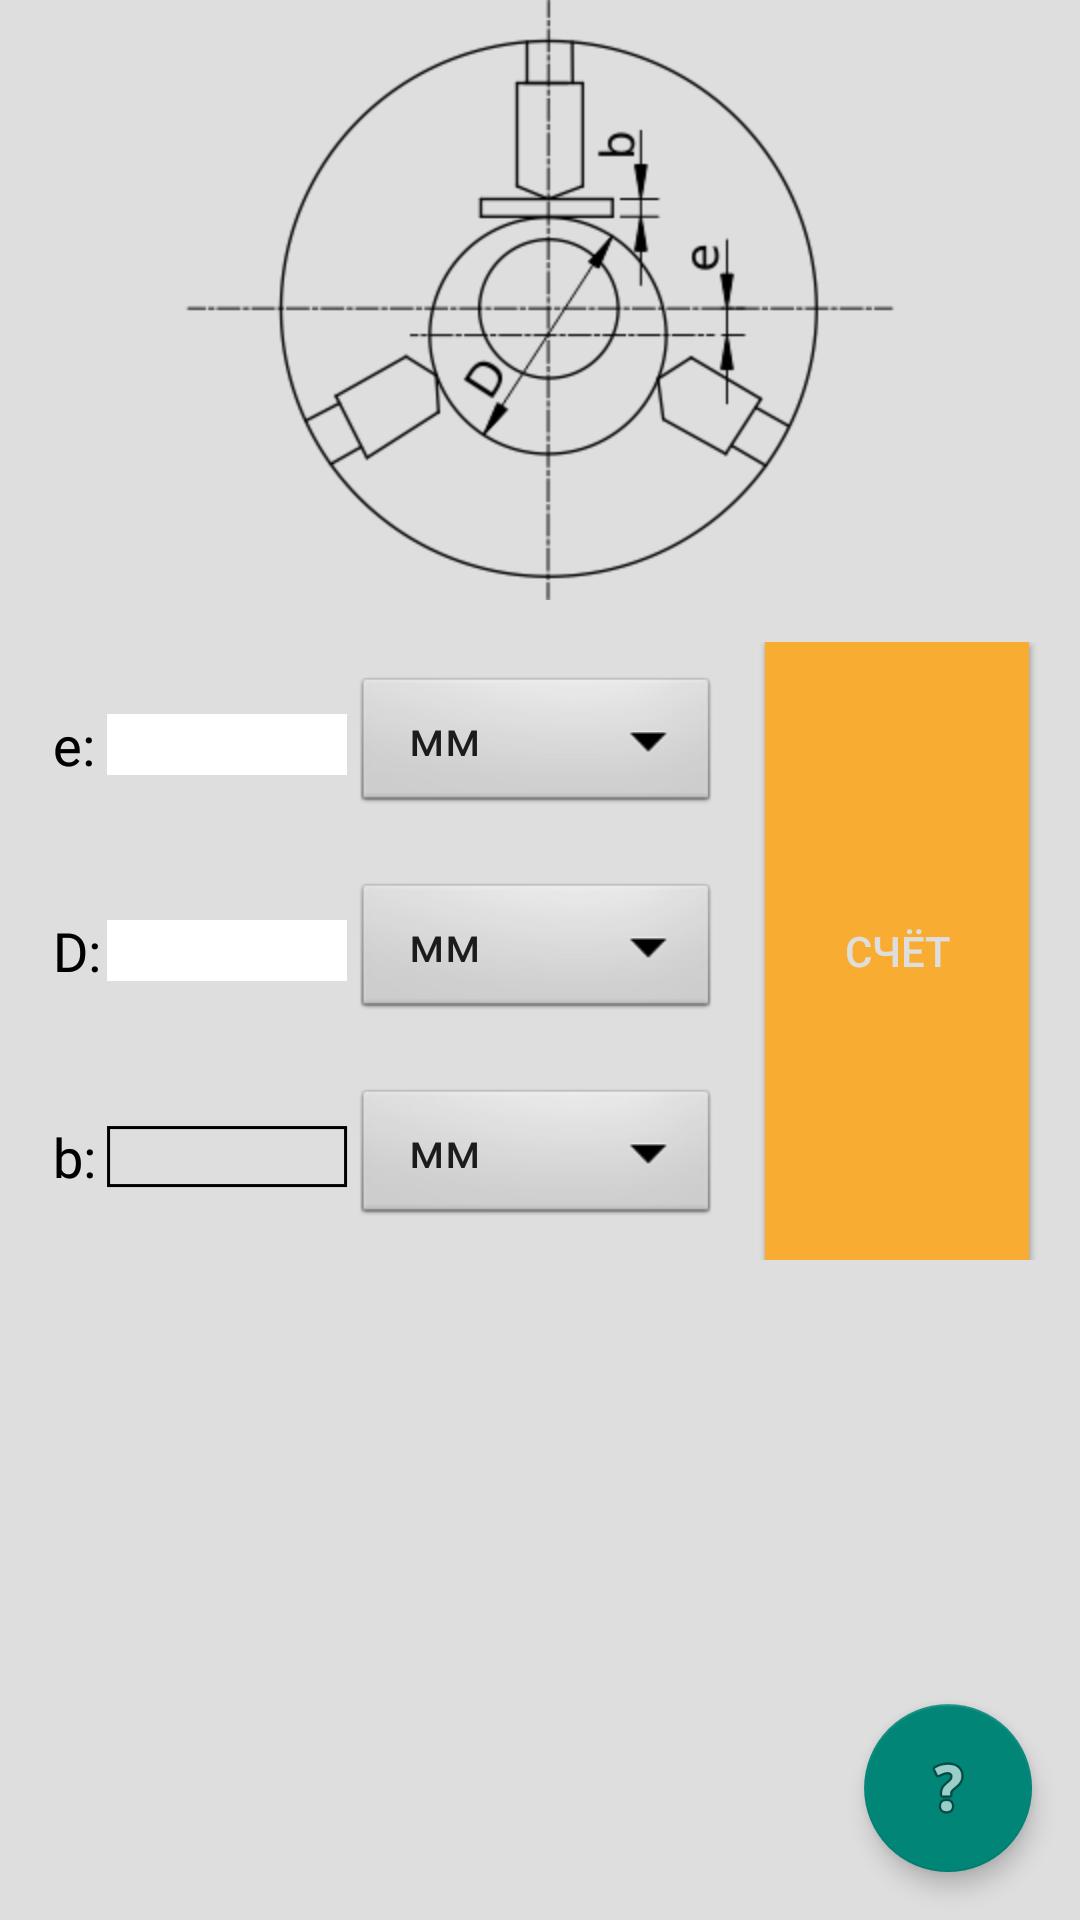 https://hot-chip.com/pics/ChipTip2/ru_cam.png